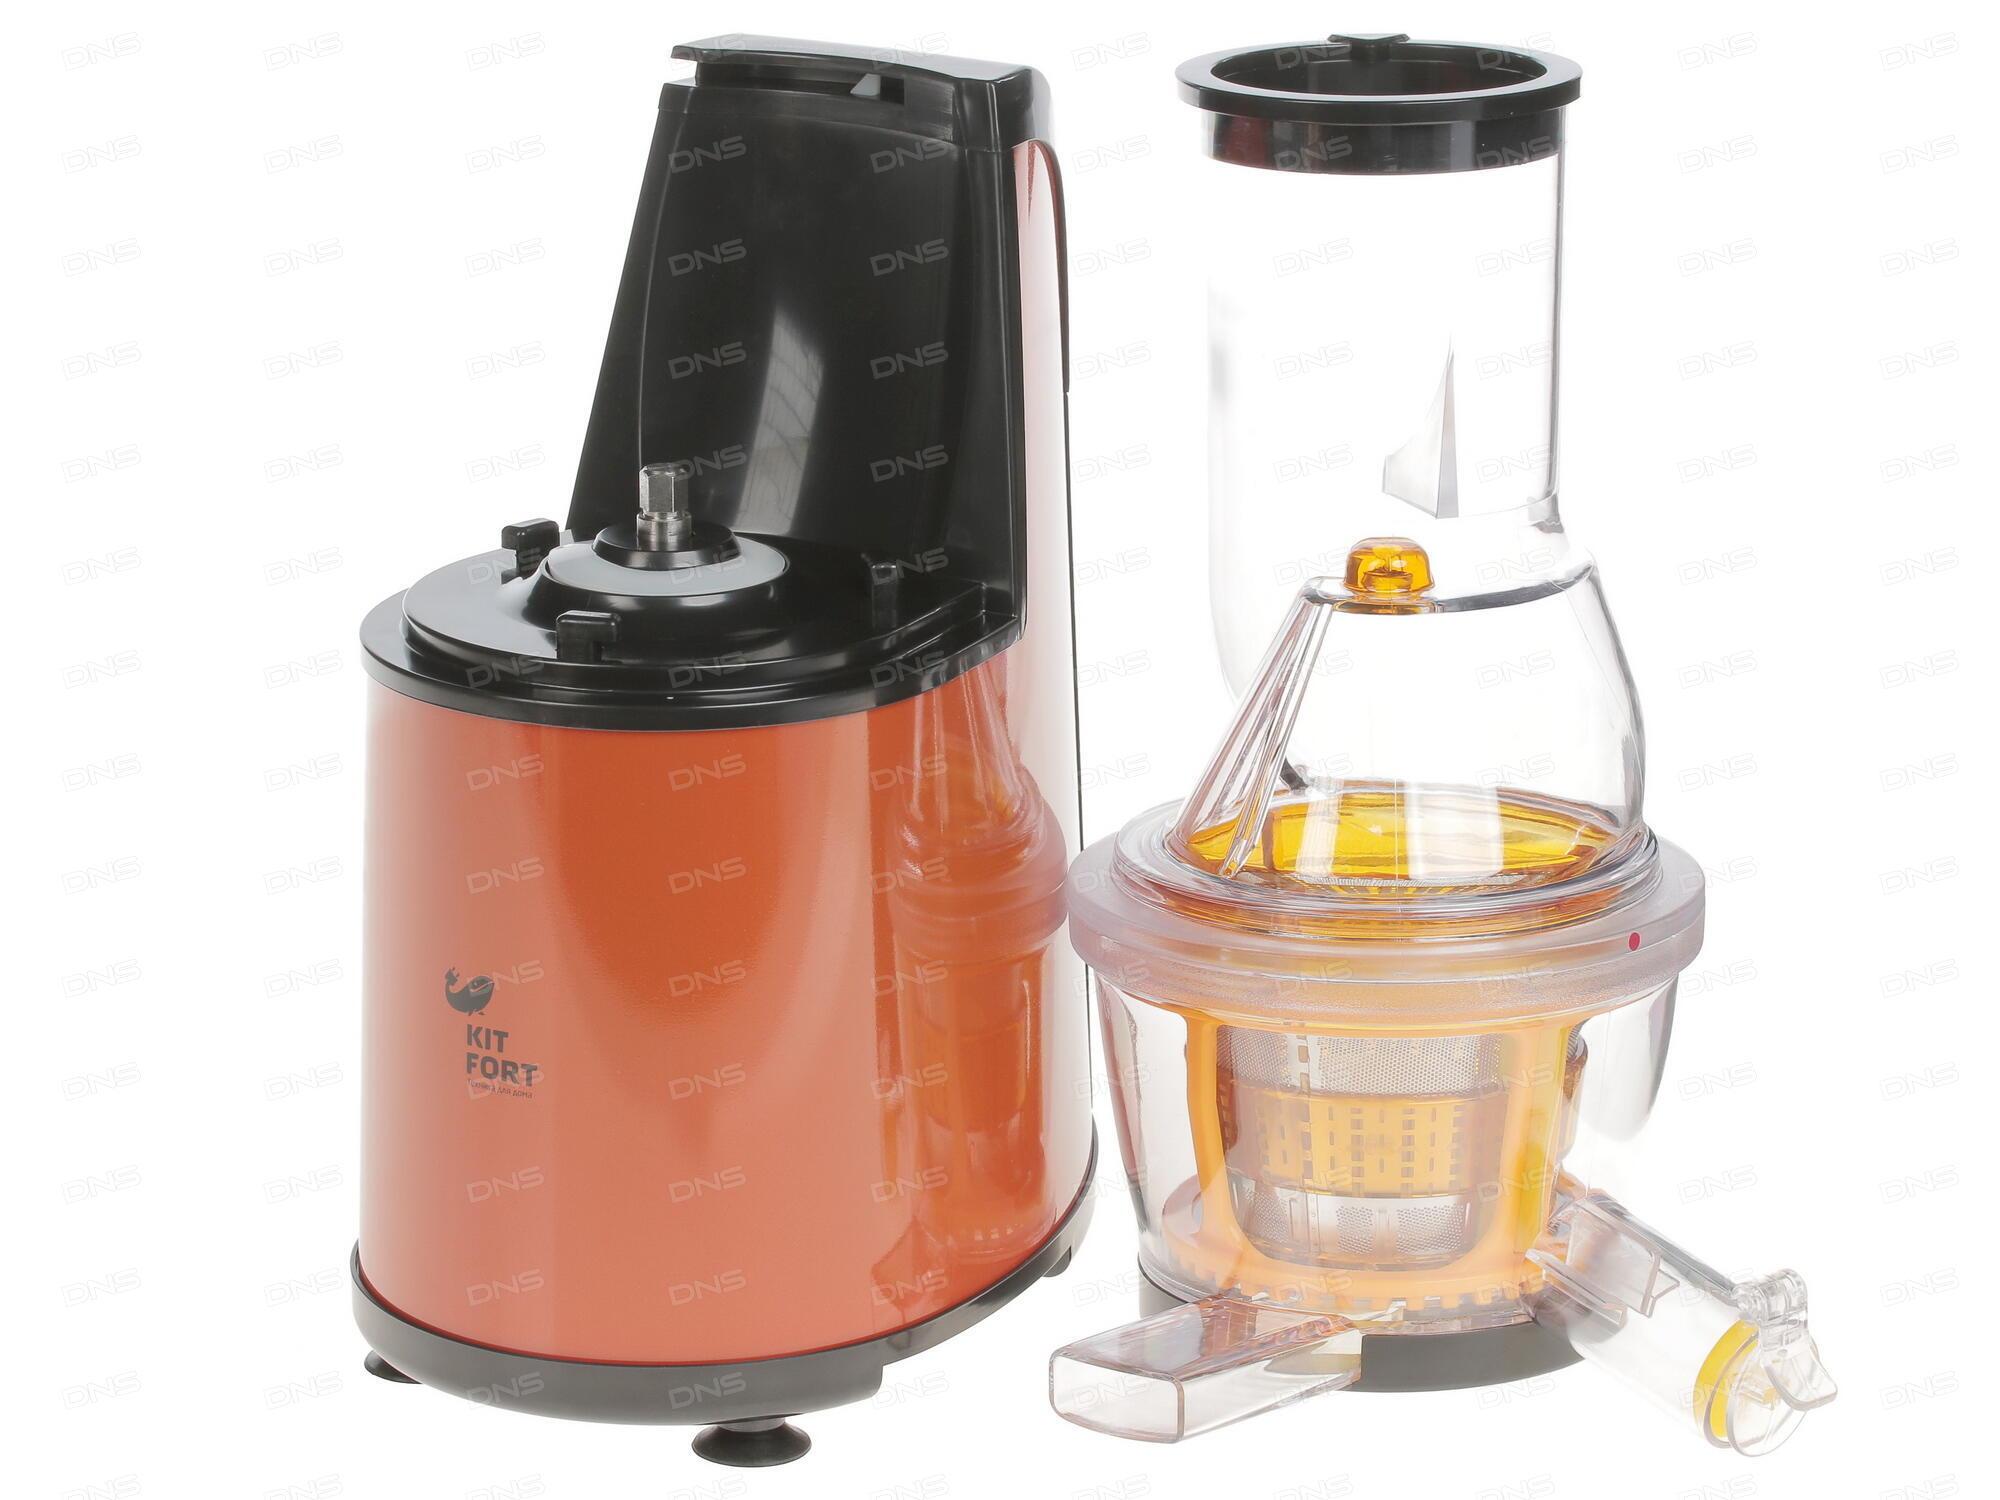 Соковыжималка Kitfort KT-1102-1 Orange